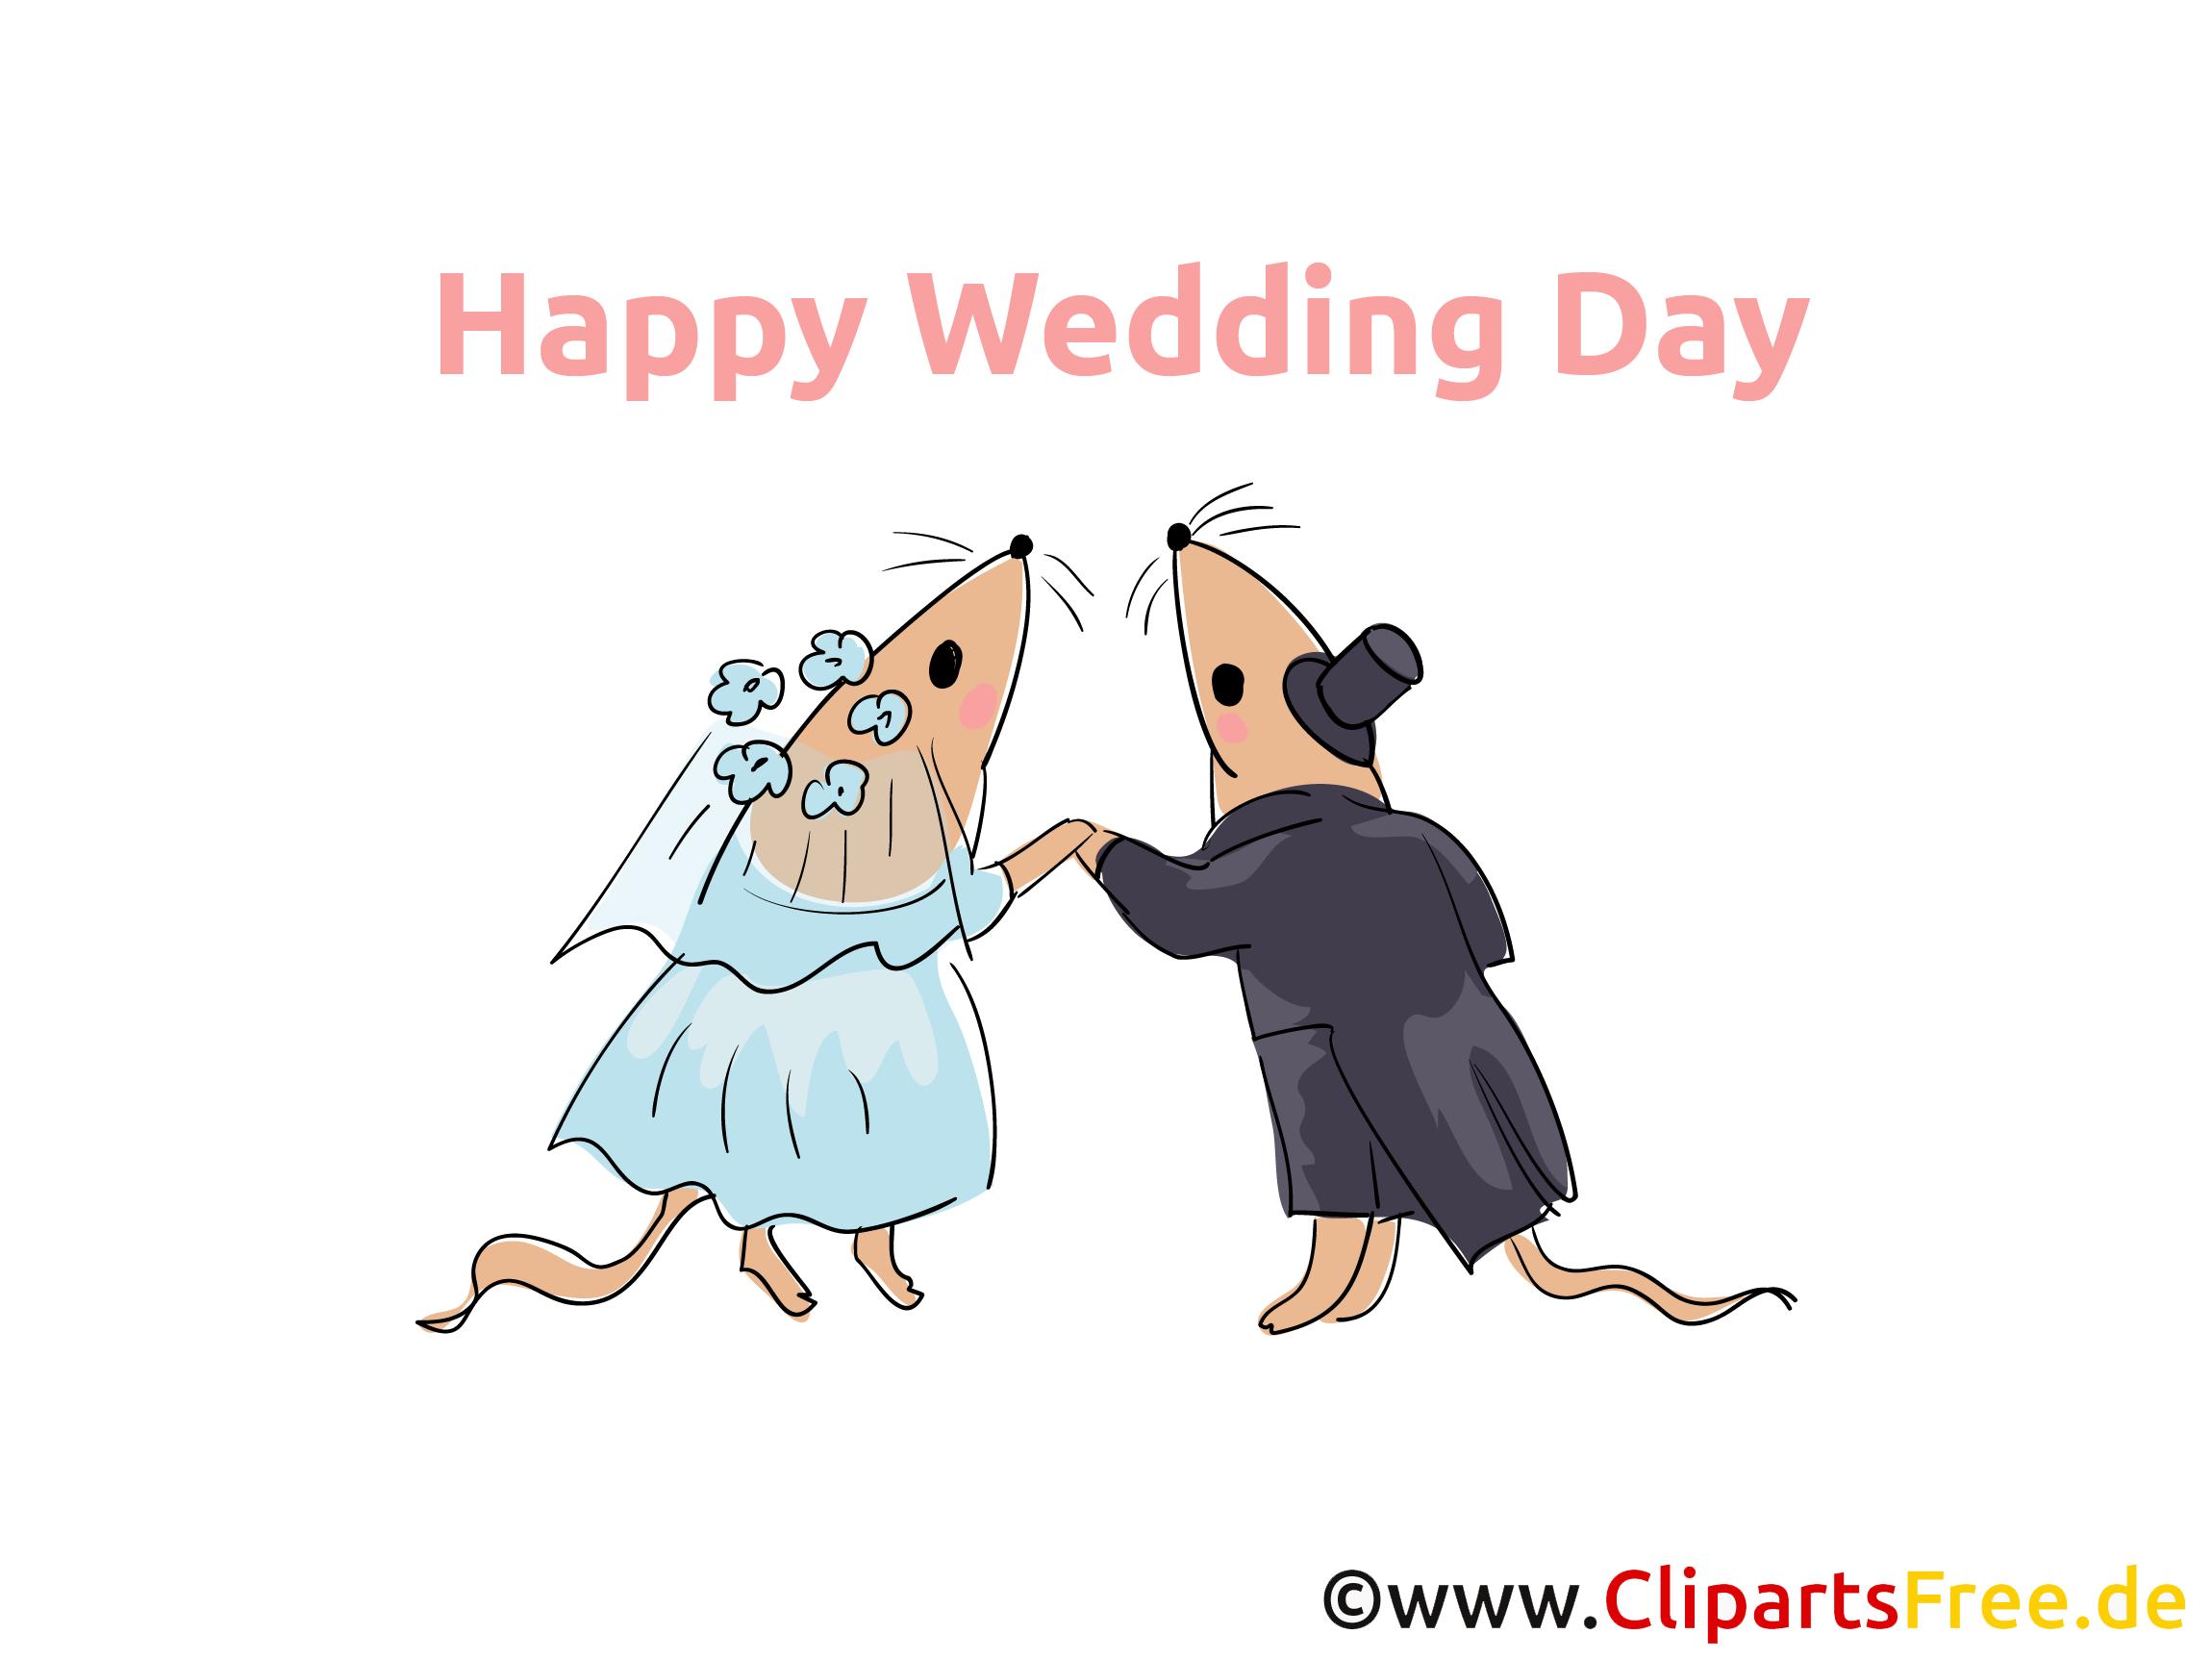 Happy Wedding Clip Art無料でダウンロード